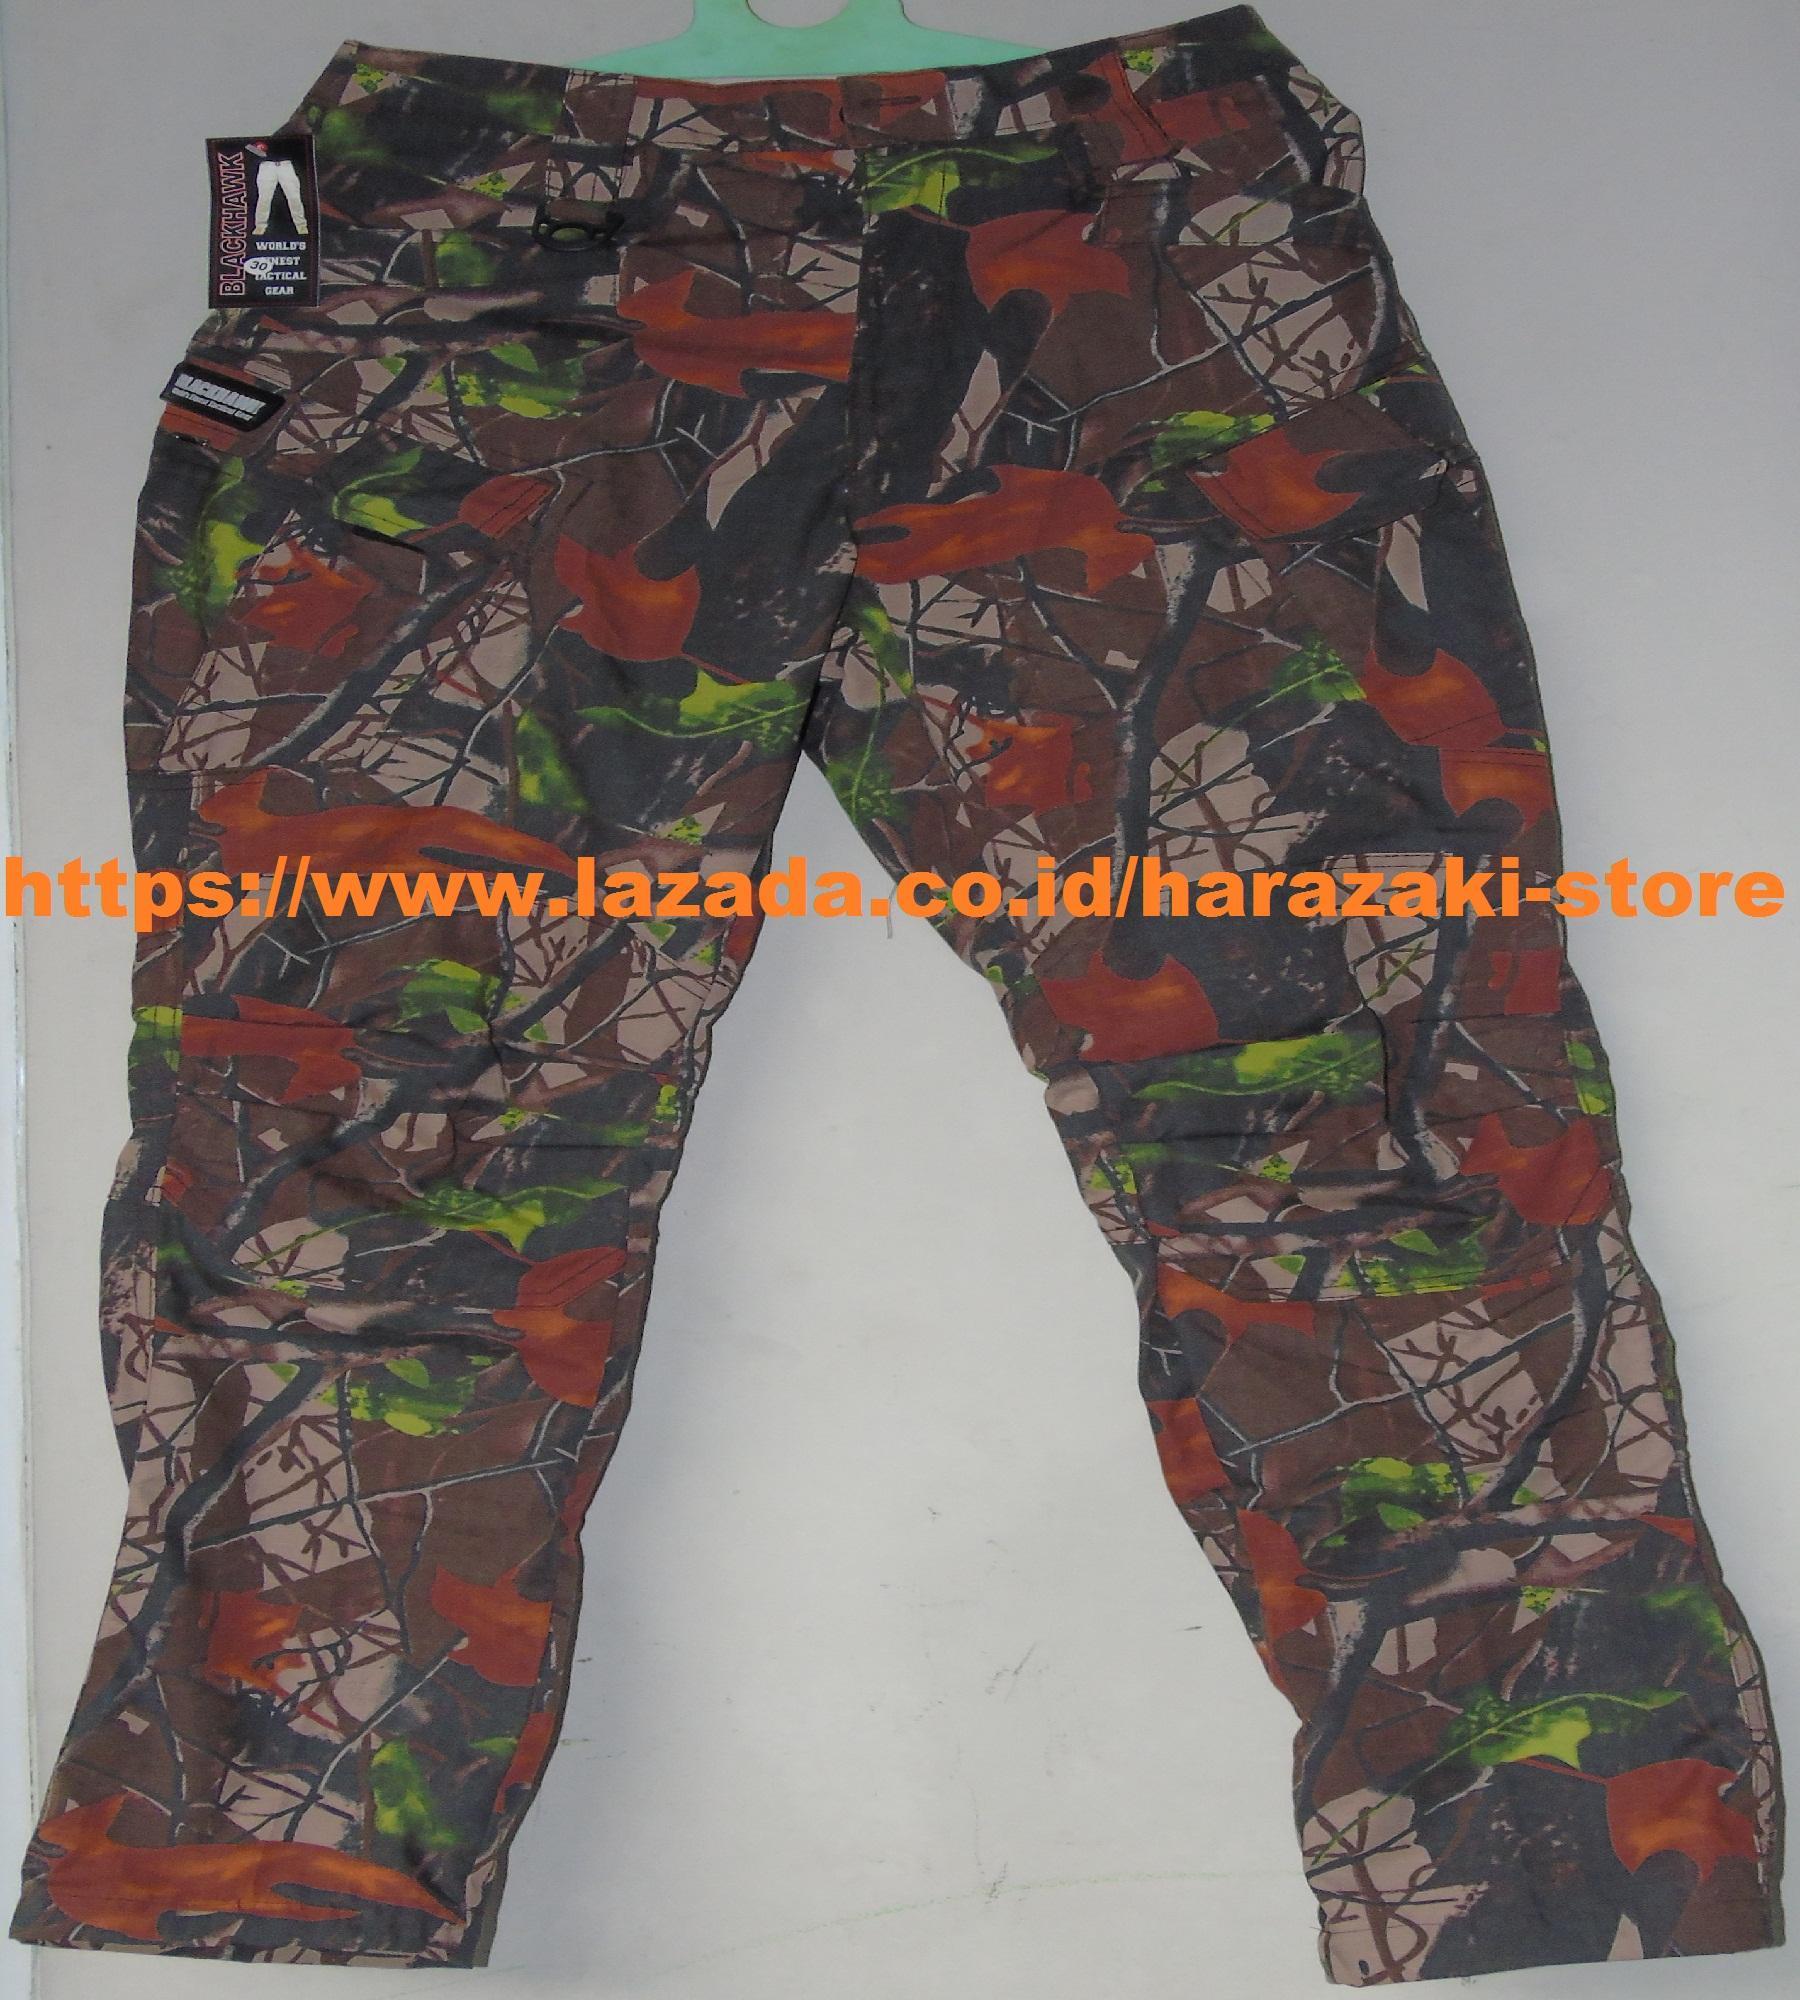 Celana Blackhawk Panjang Perbakin / Celana Tactical Taktikal Blackhawk Hijau Army / Celana Outdoor / Celana